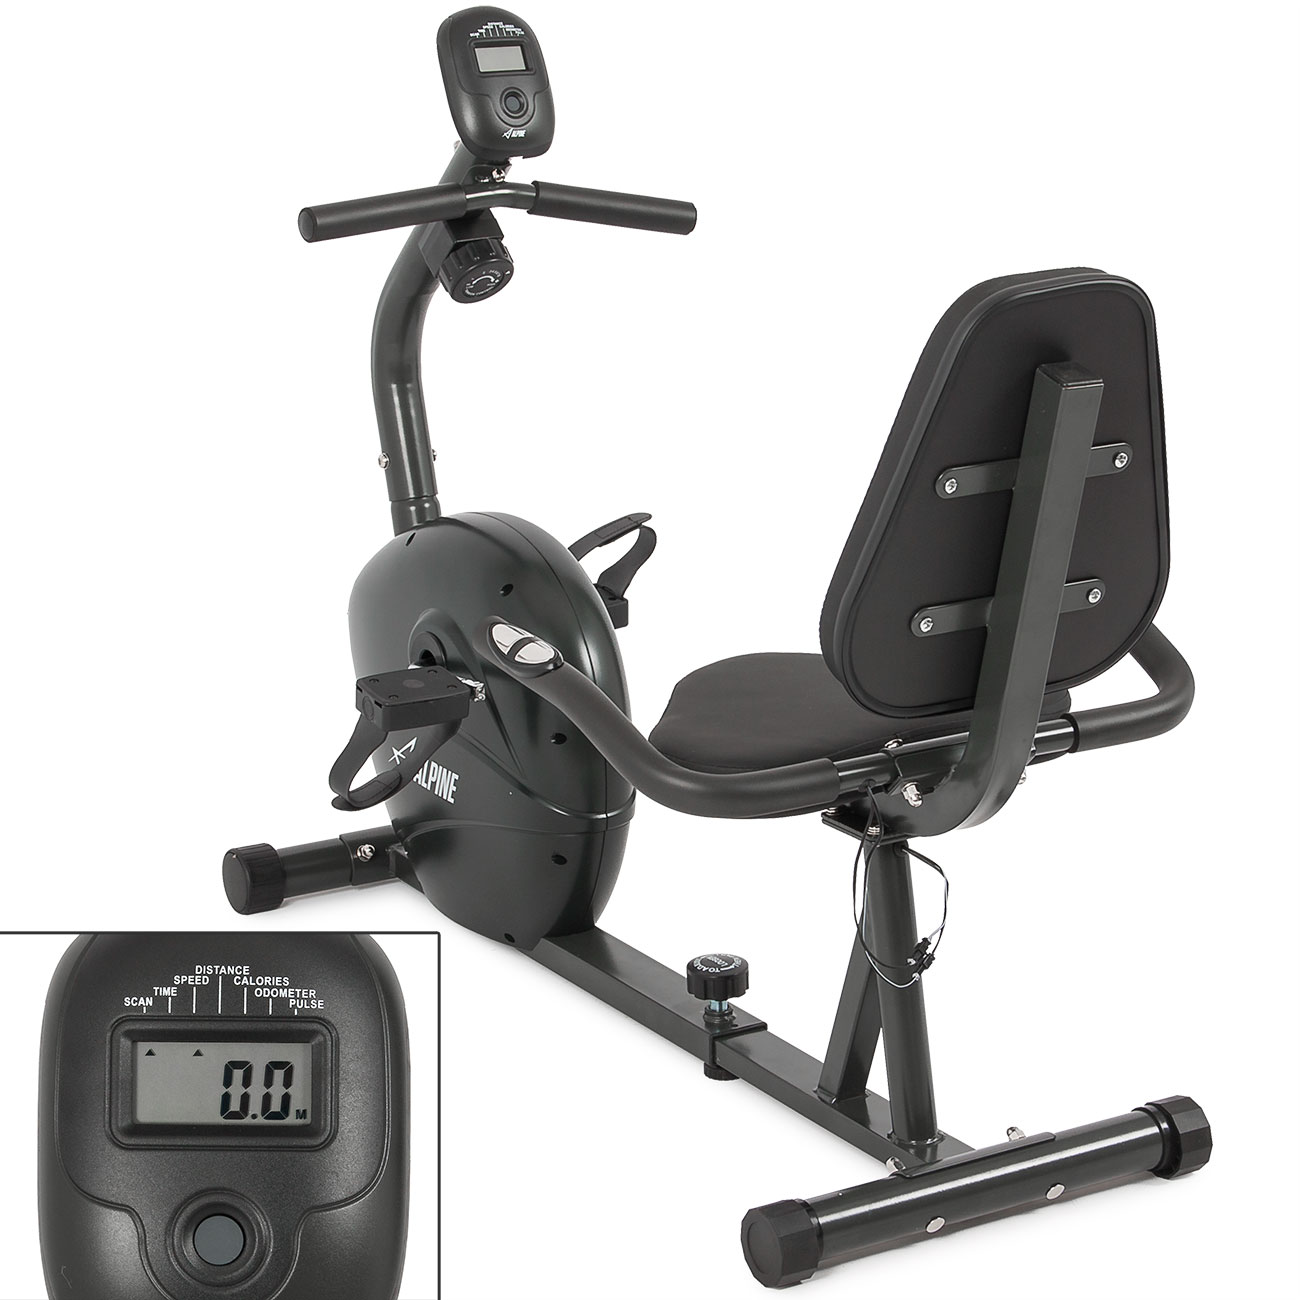 Recumbent cycle cardio exercise fitness stationary gym